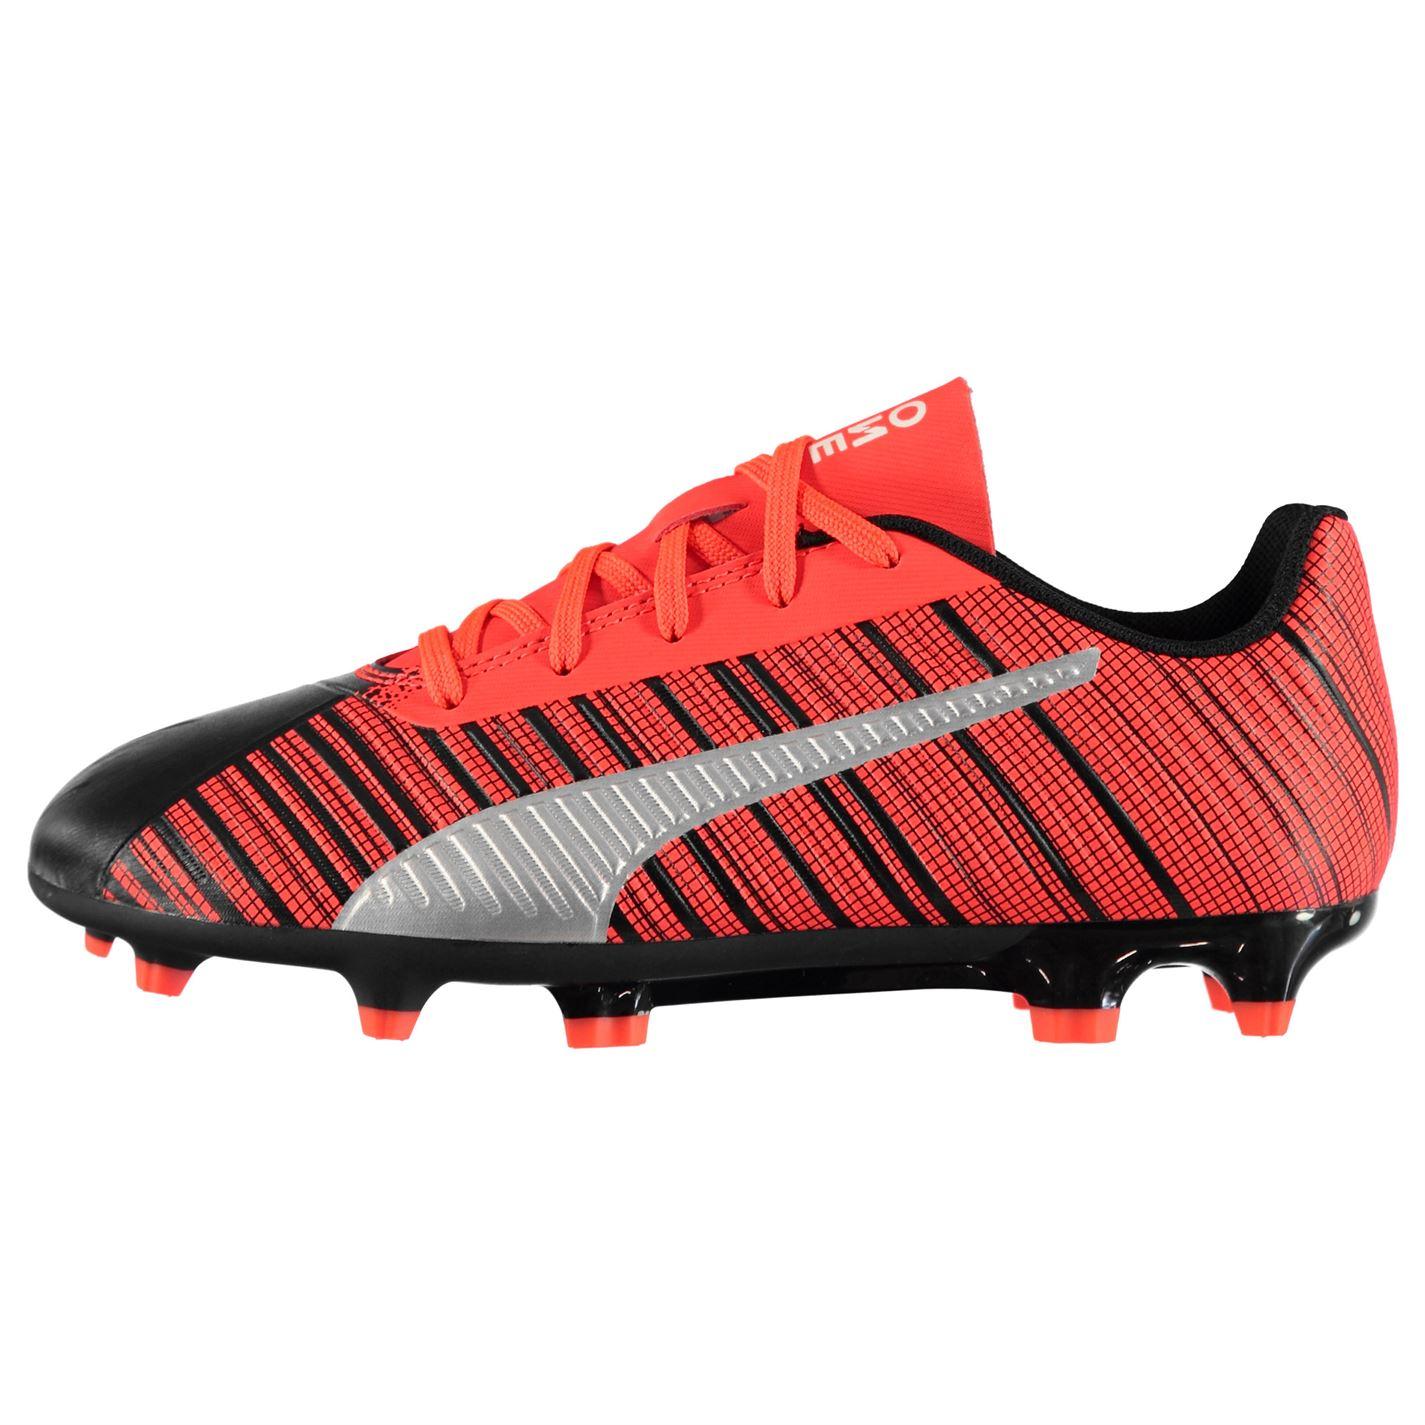 Puma ONE 5.4 FG Junior's Football Boots